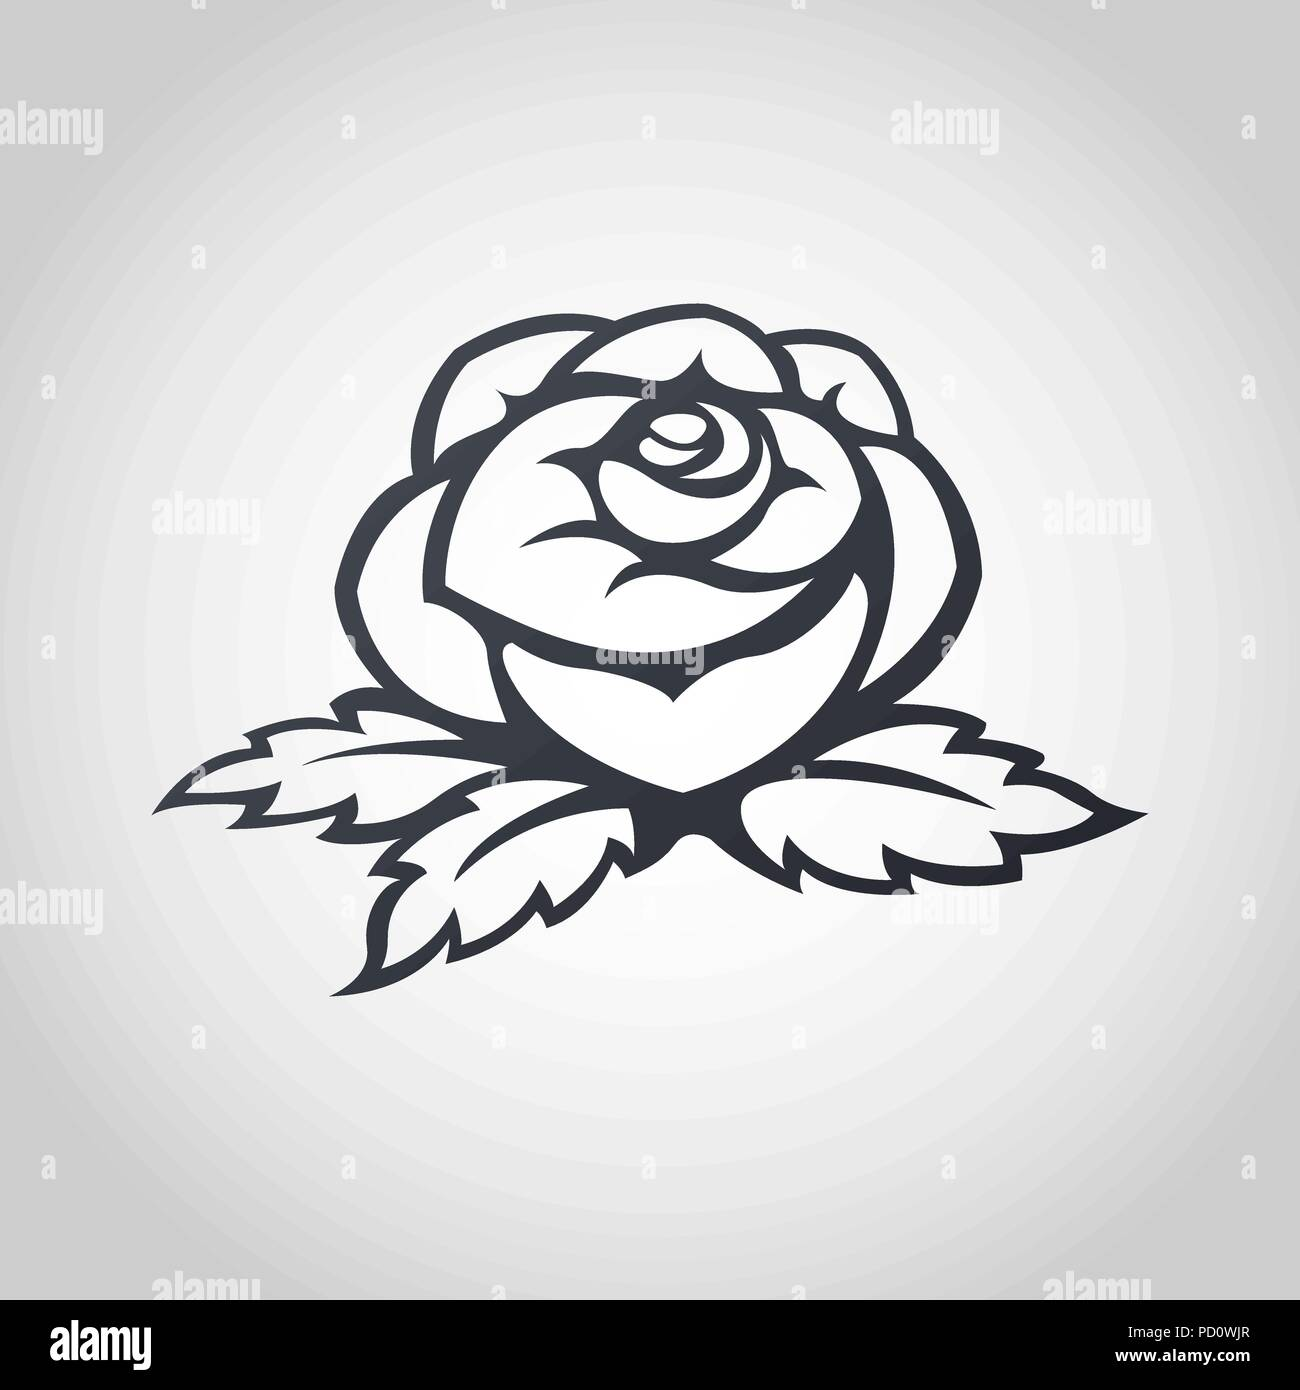 Rose Vector Logo Icon Illustration Stock Vector Art Illustration